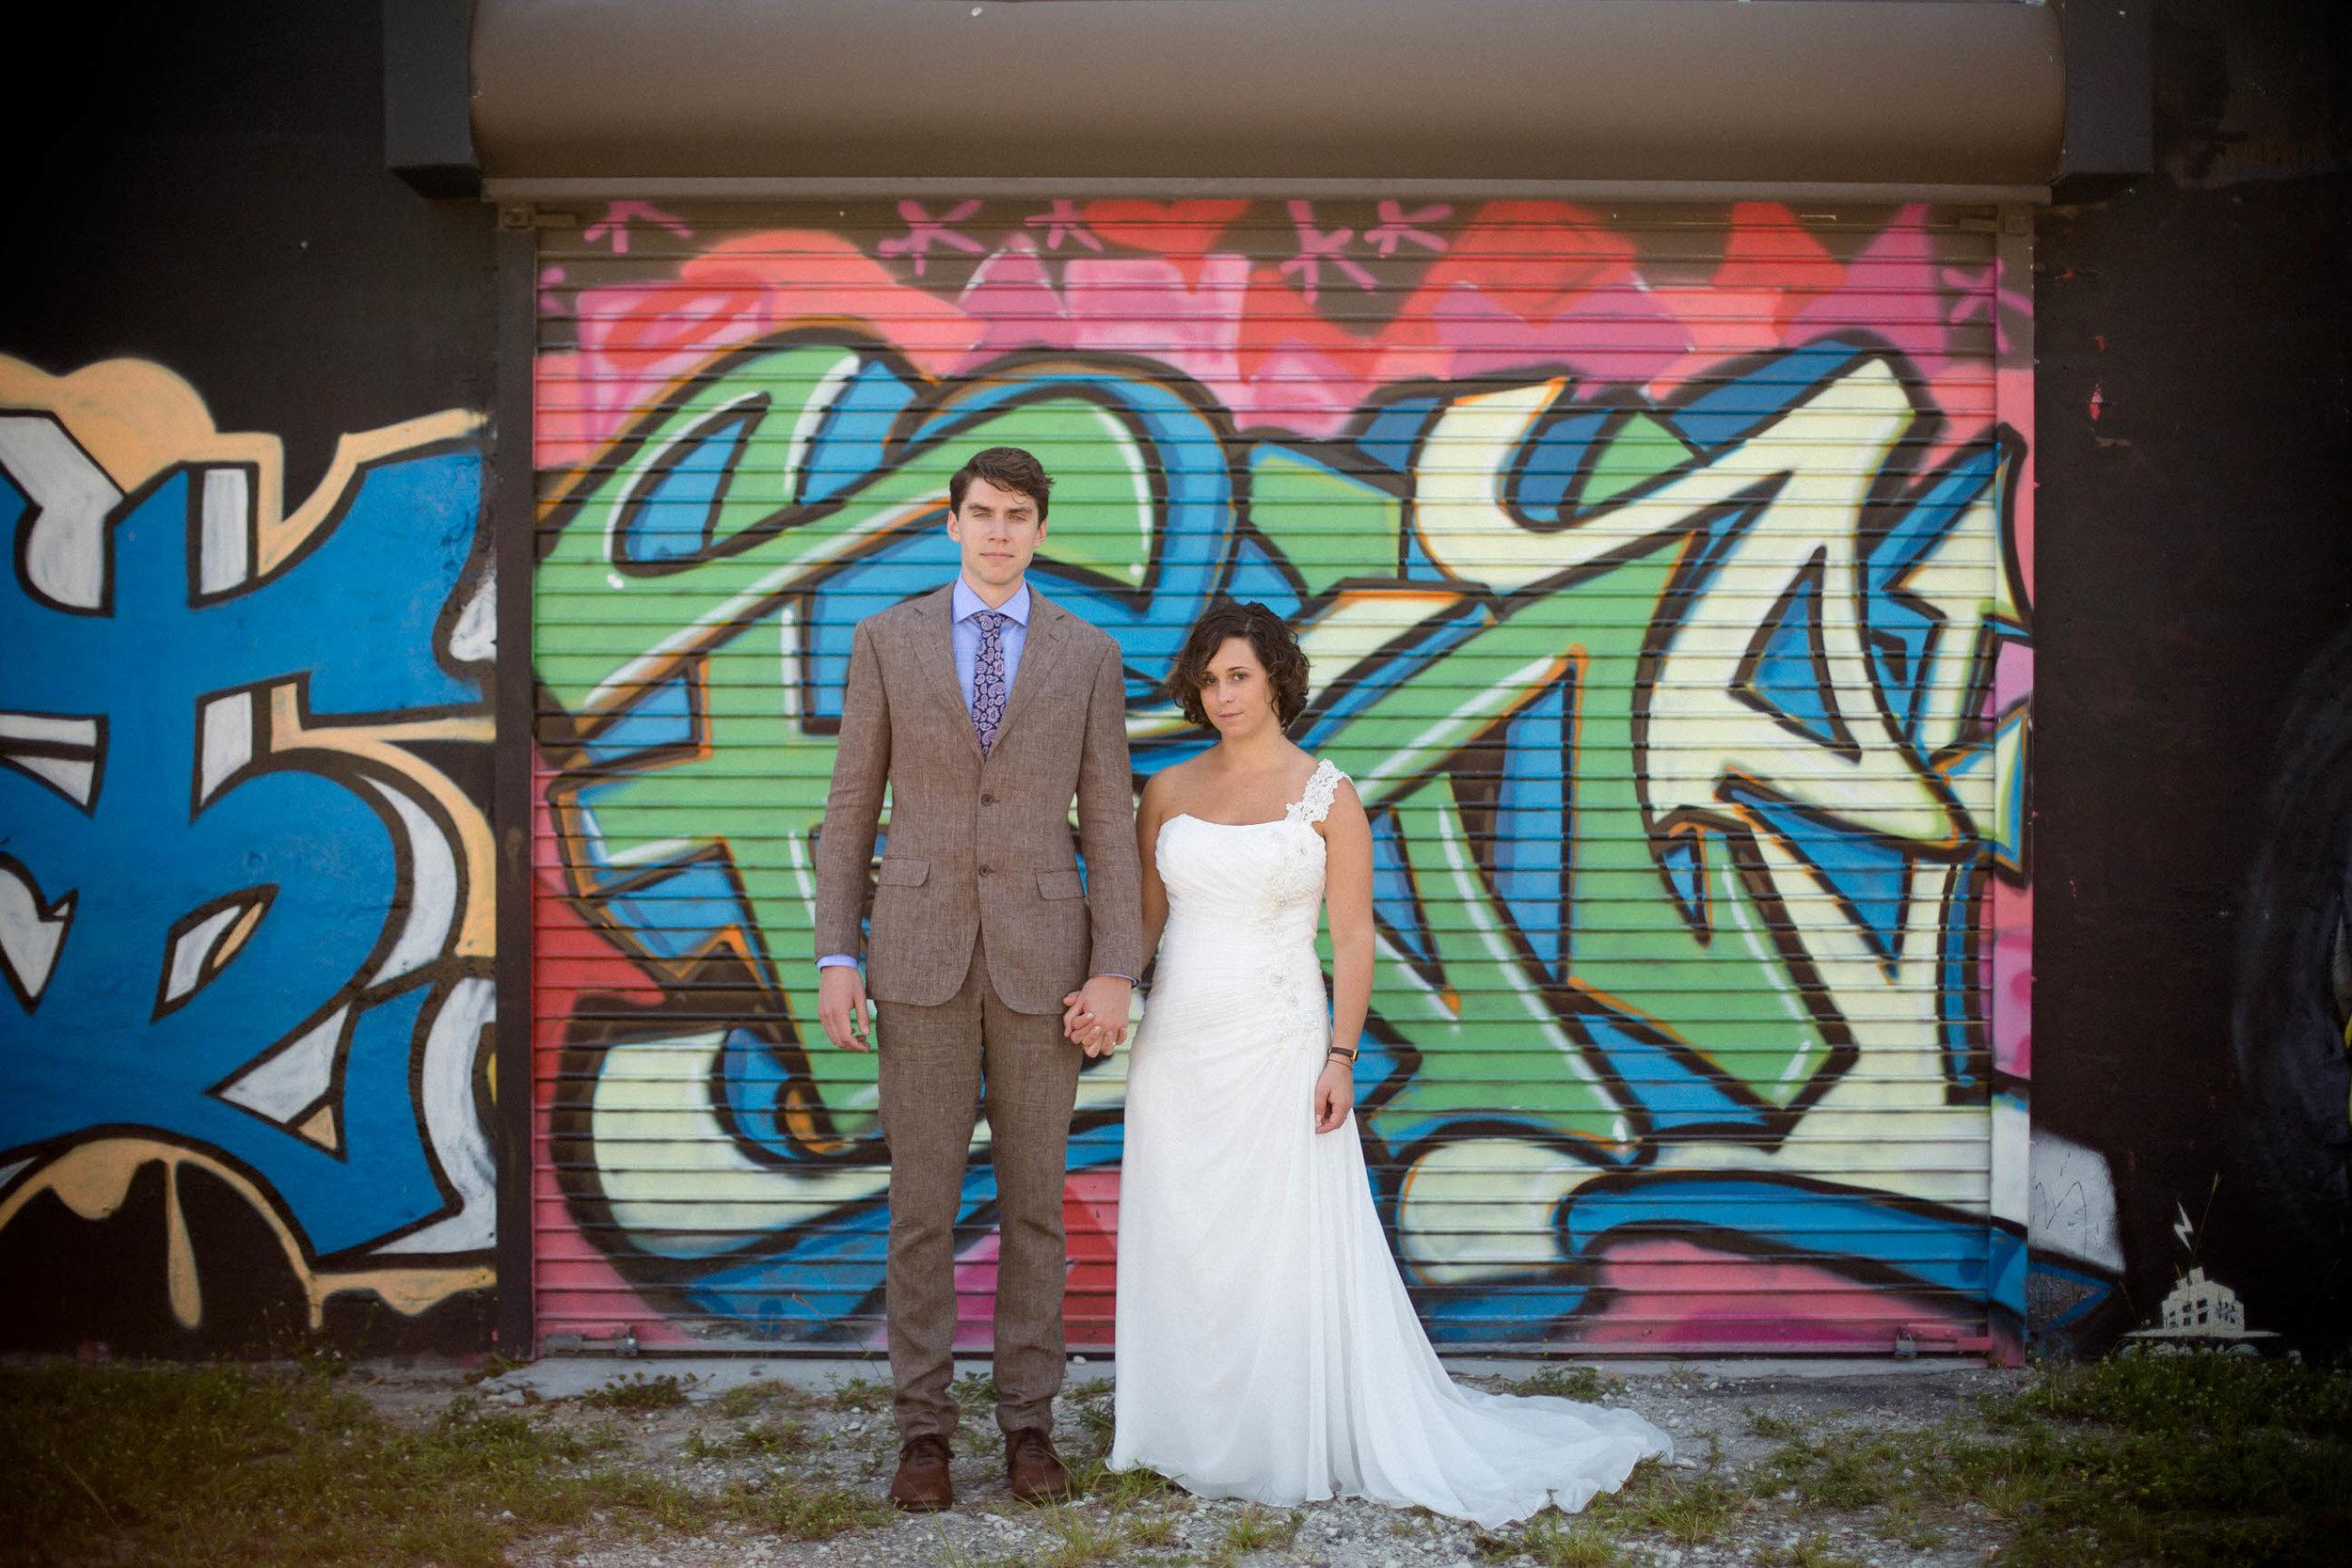 graffiti-wedding-portraits-fort-lauderdale-tiny-house-photo.jpg